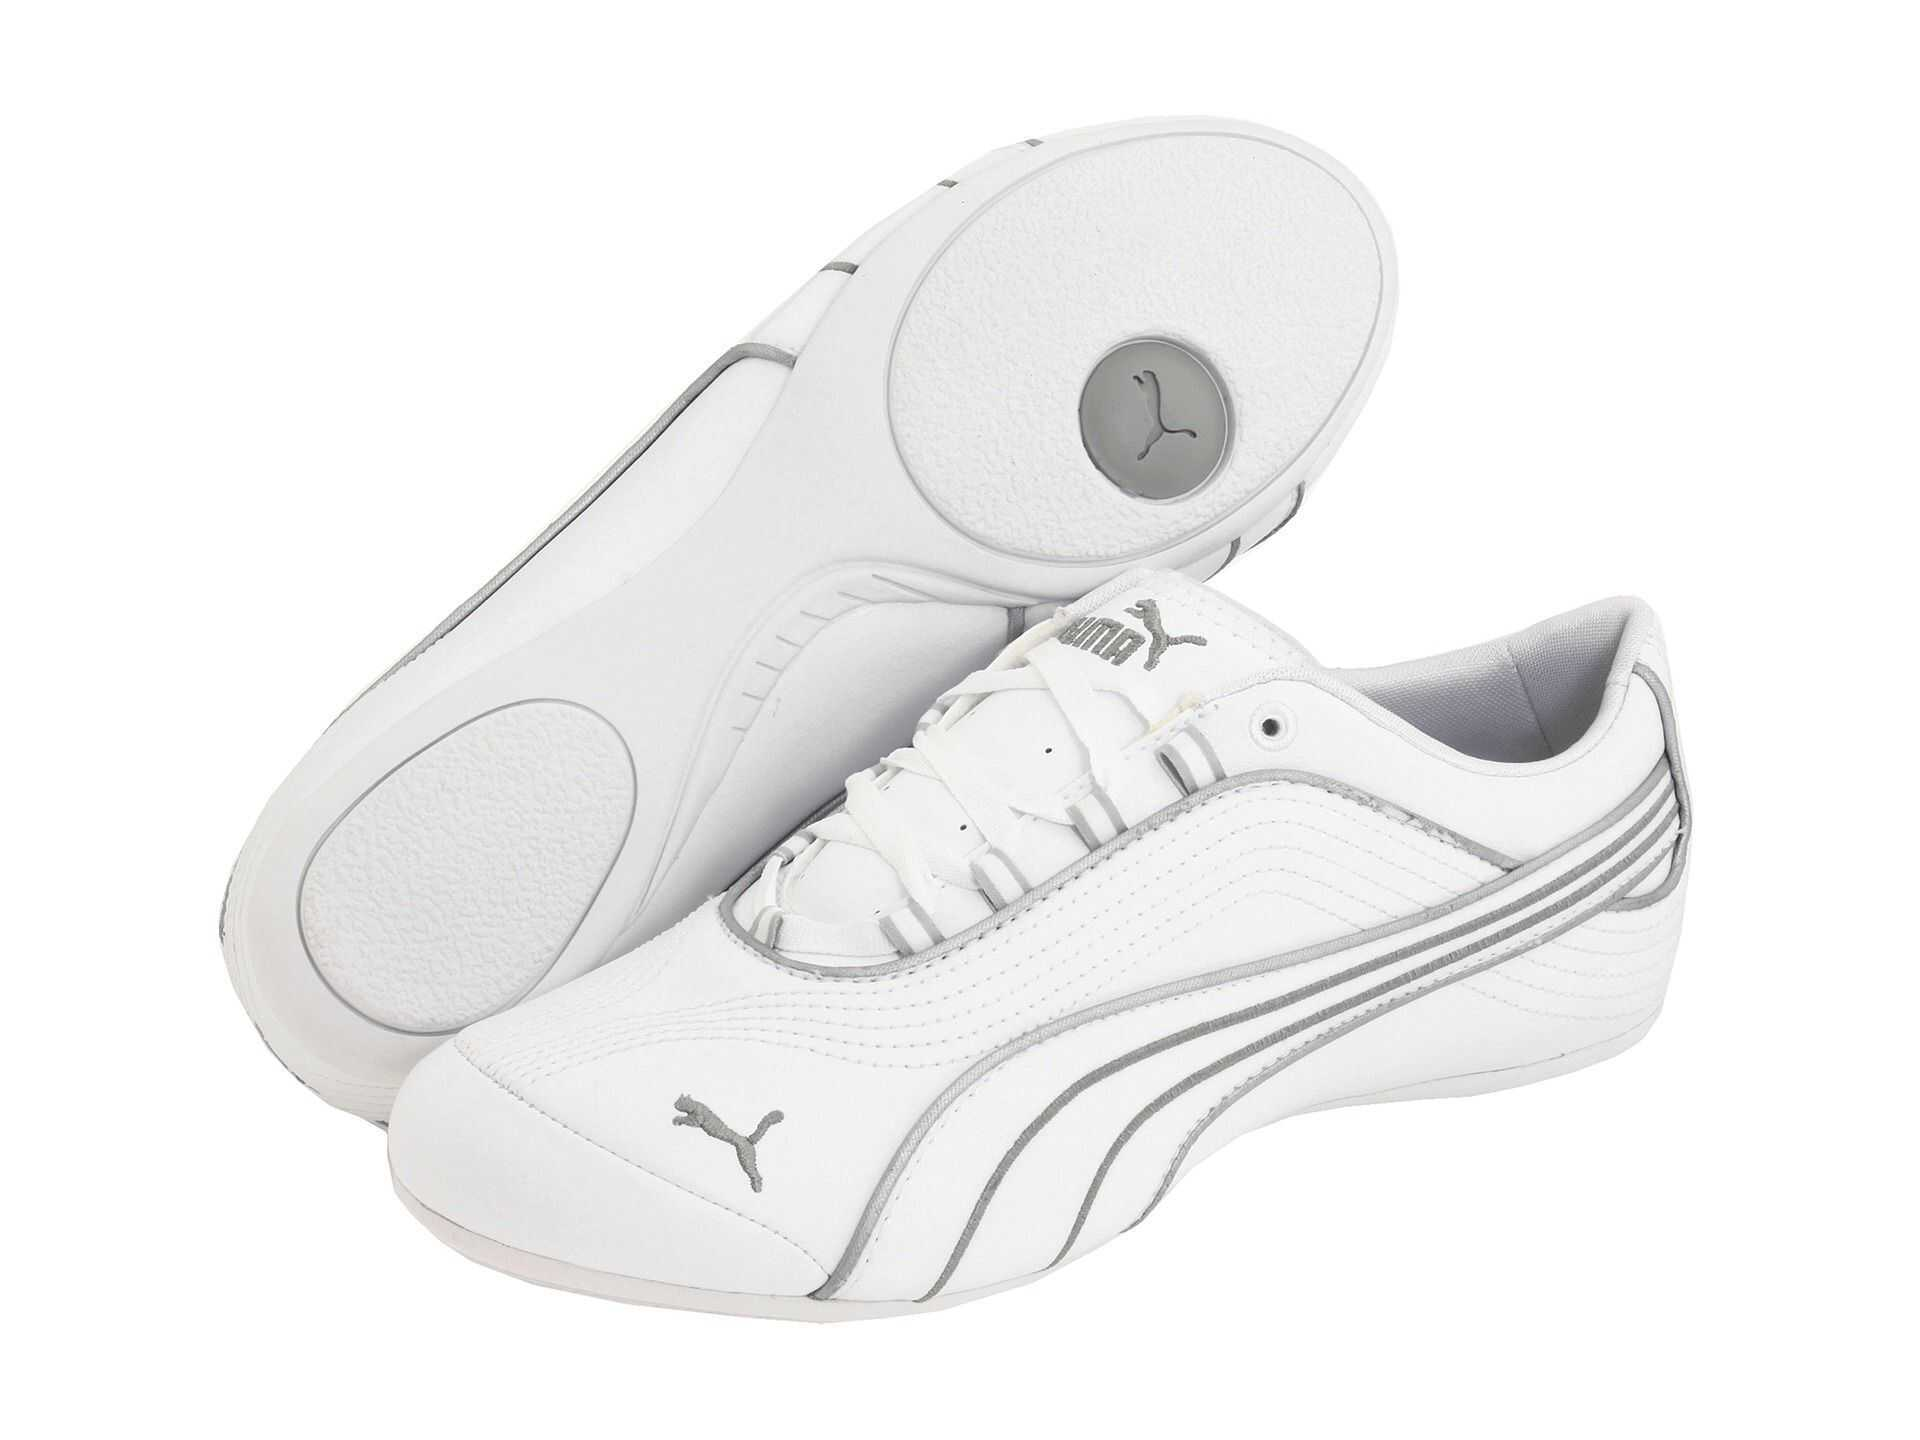 Puma Soleil Fs Wns White/puma Silver